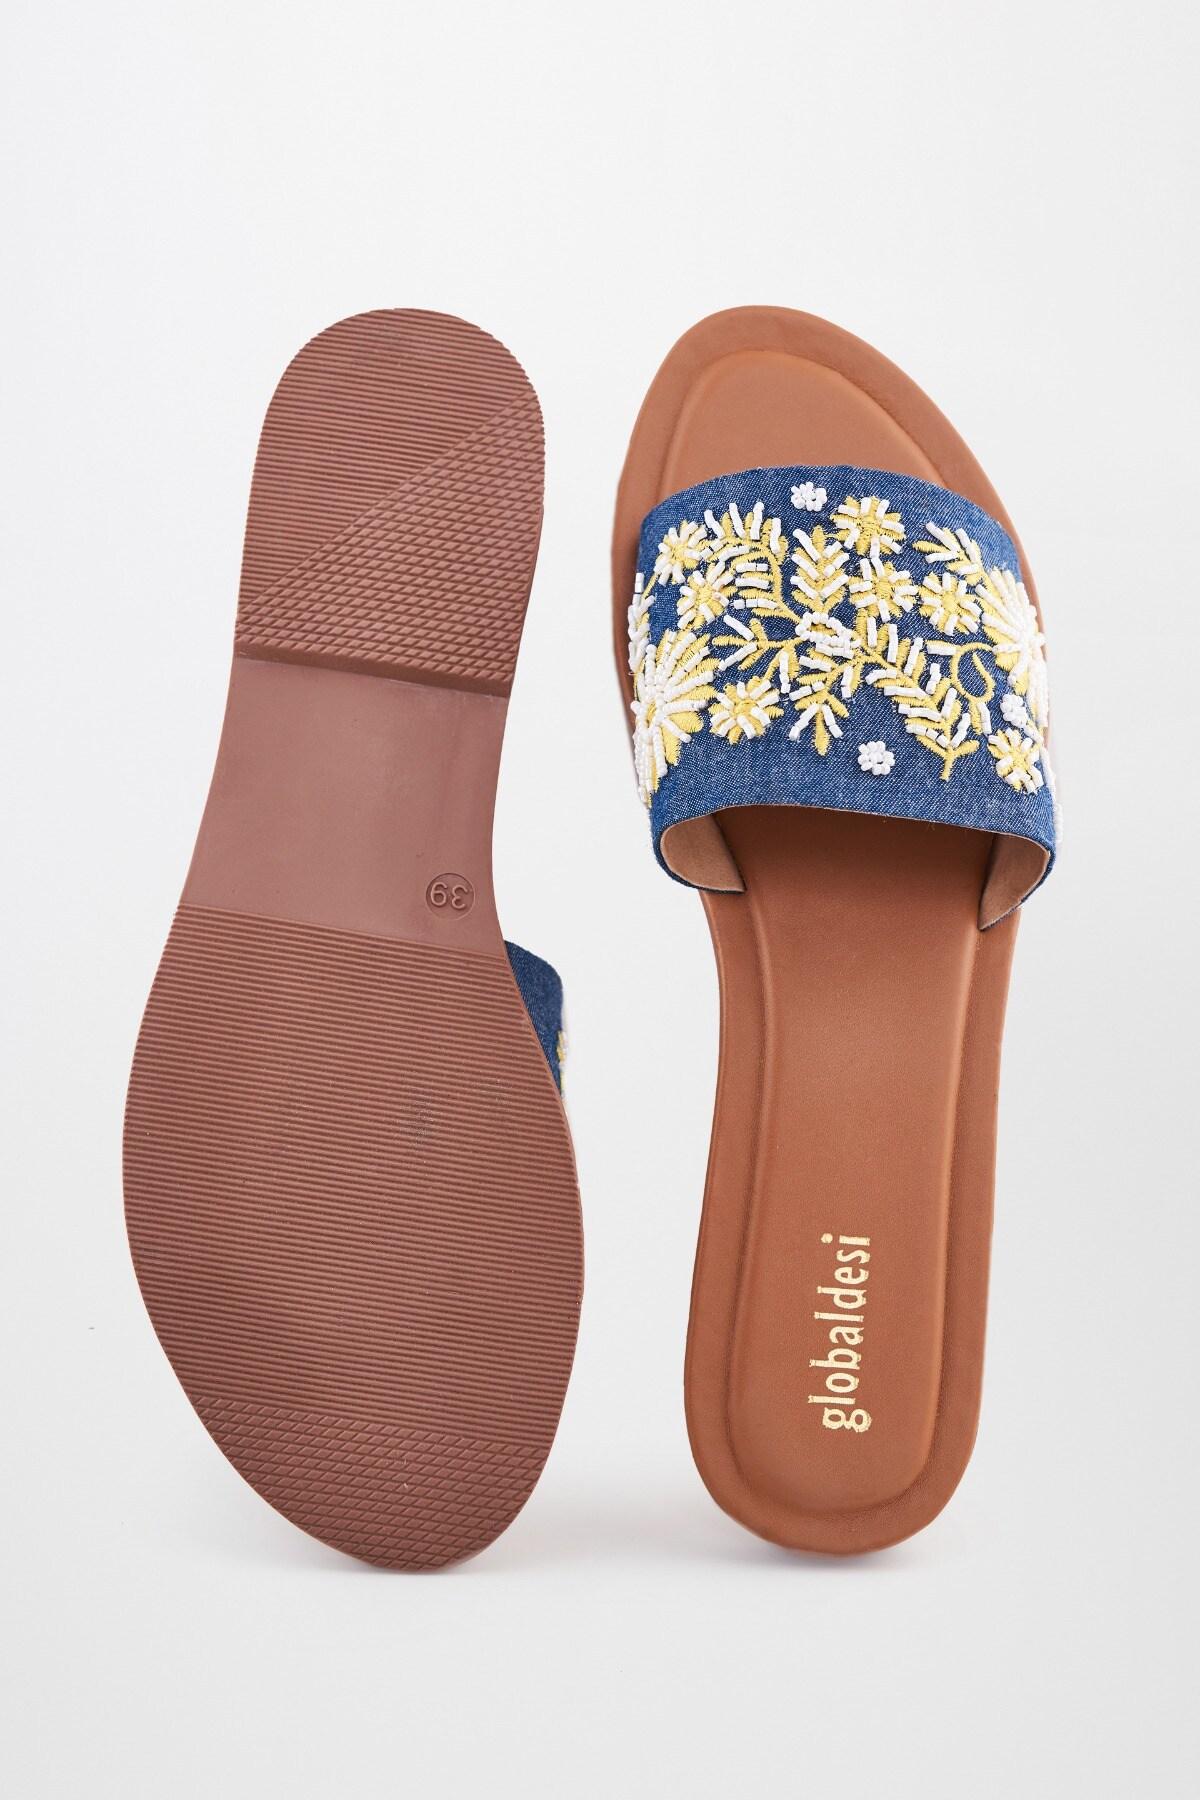 Global Desi | Denim Embroidered Flats